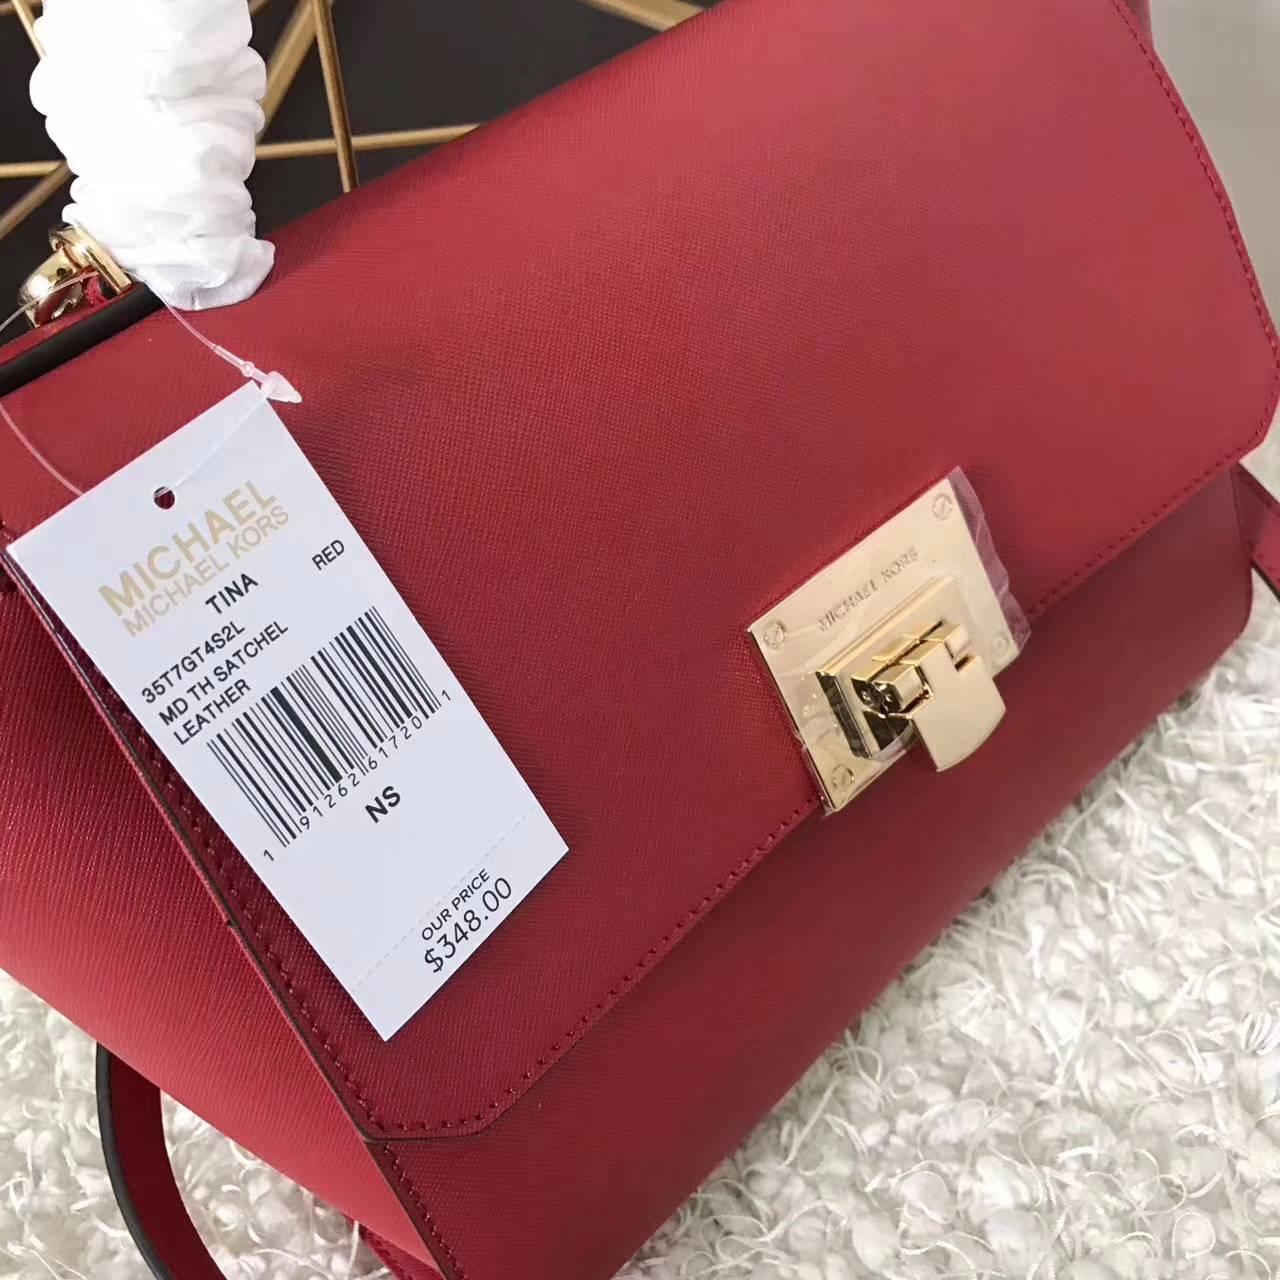 MK包包批发 迈克科尔斯新款耳朵包秋千包 大红色十字纹牛皮26CM